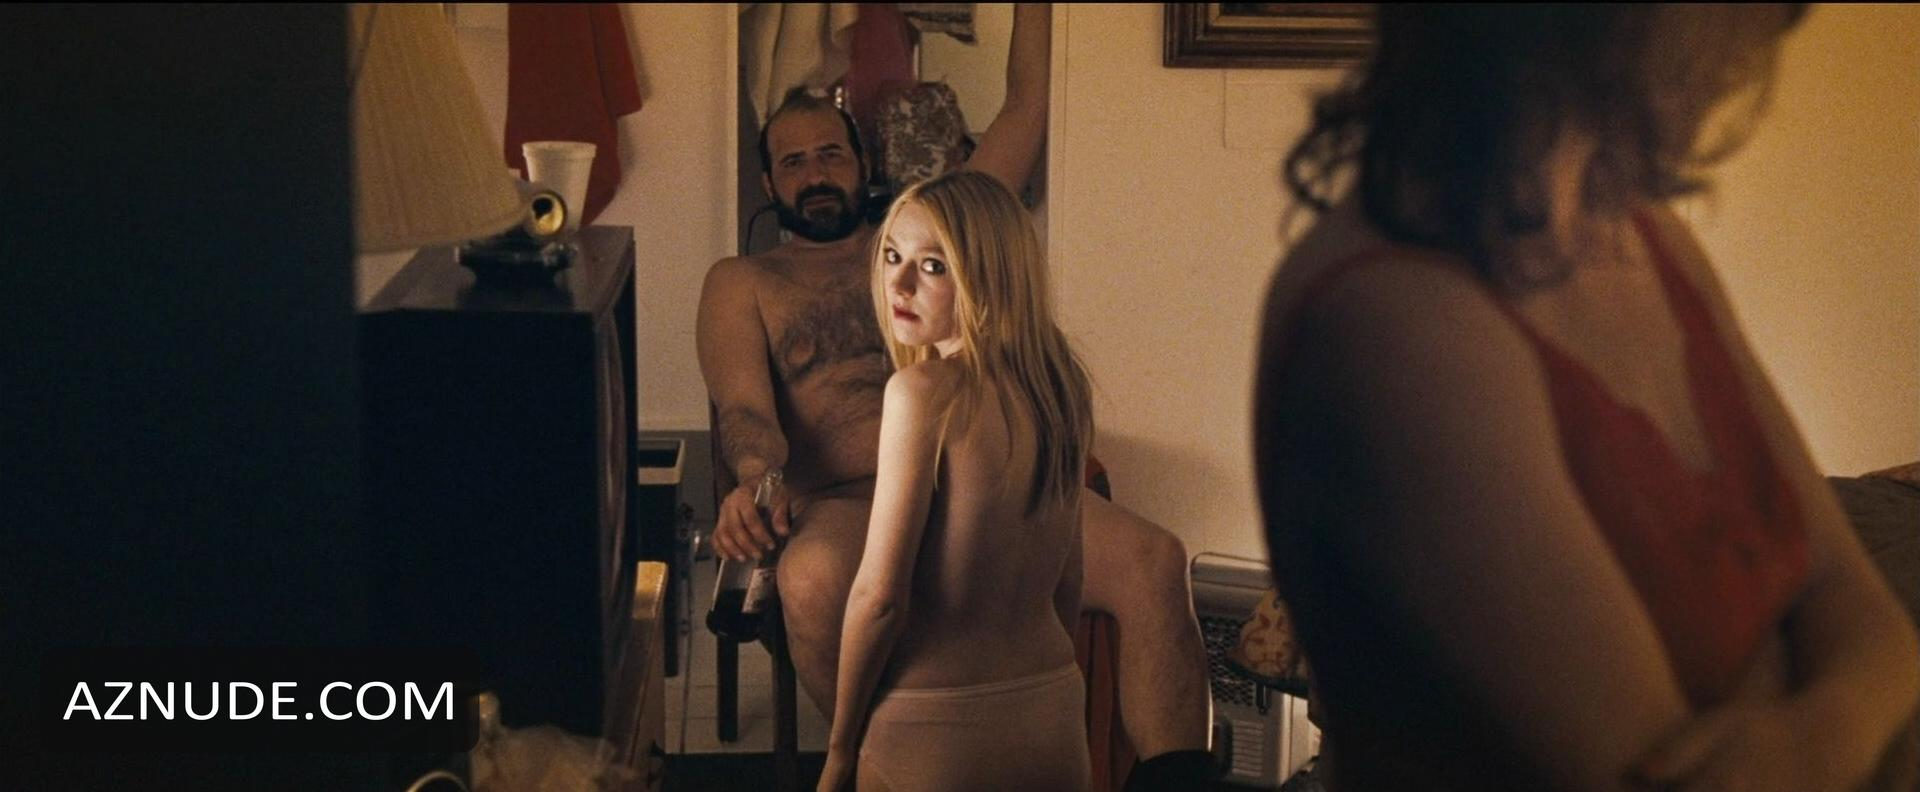 Nude fanning bikini dakota